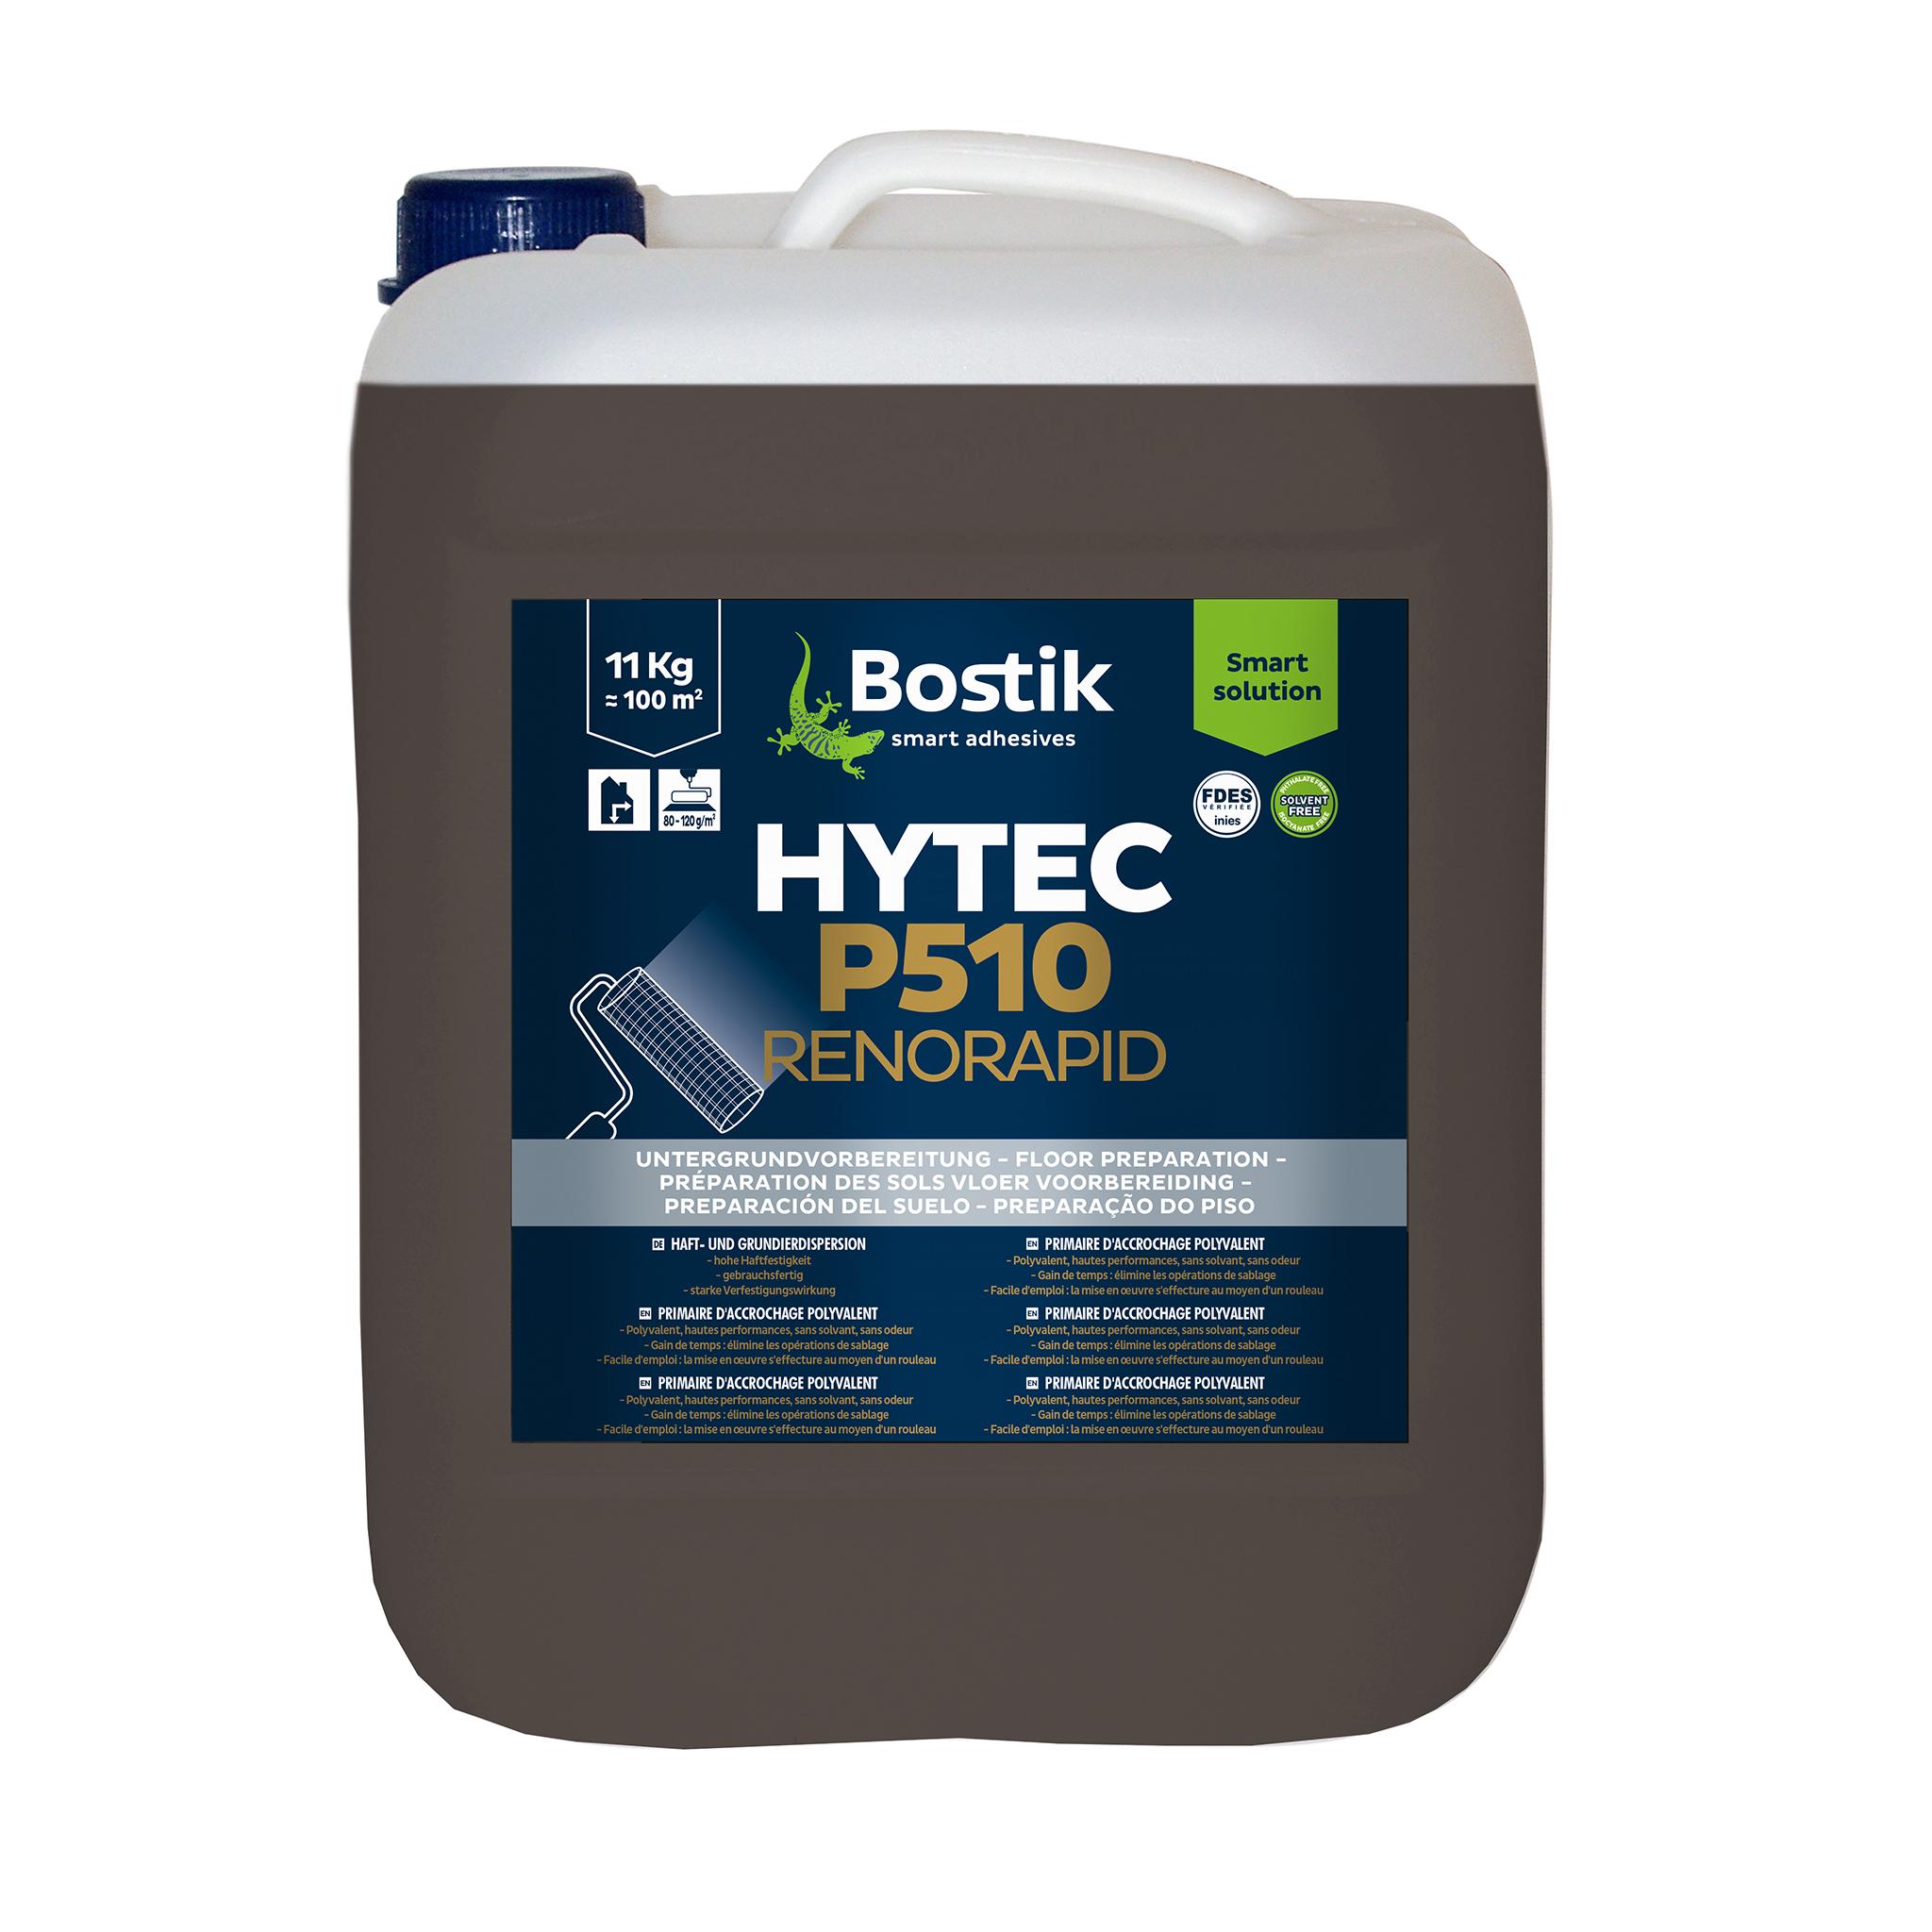 Bostik HYTEC P510 RENORAPID 11 Kg